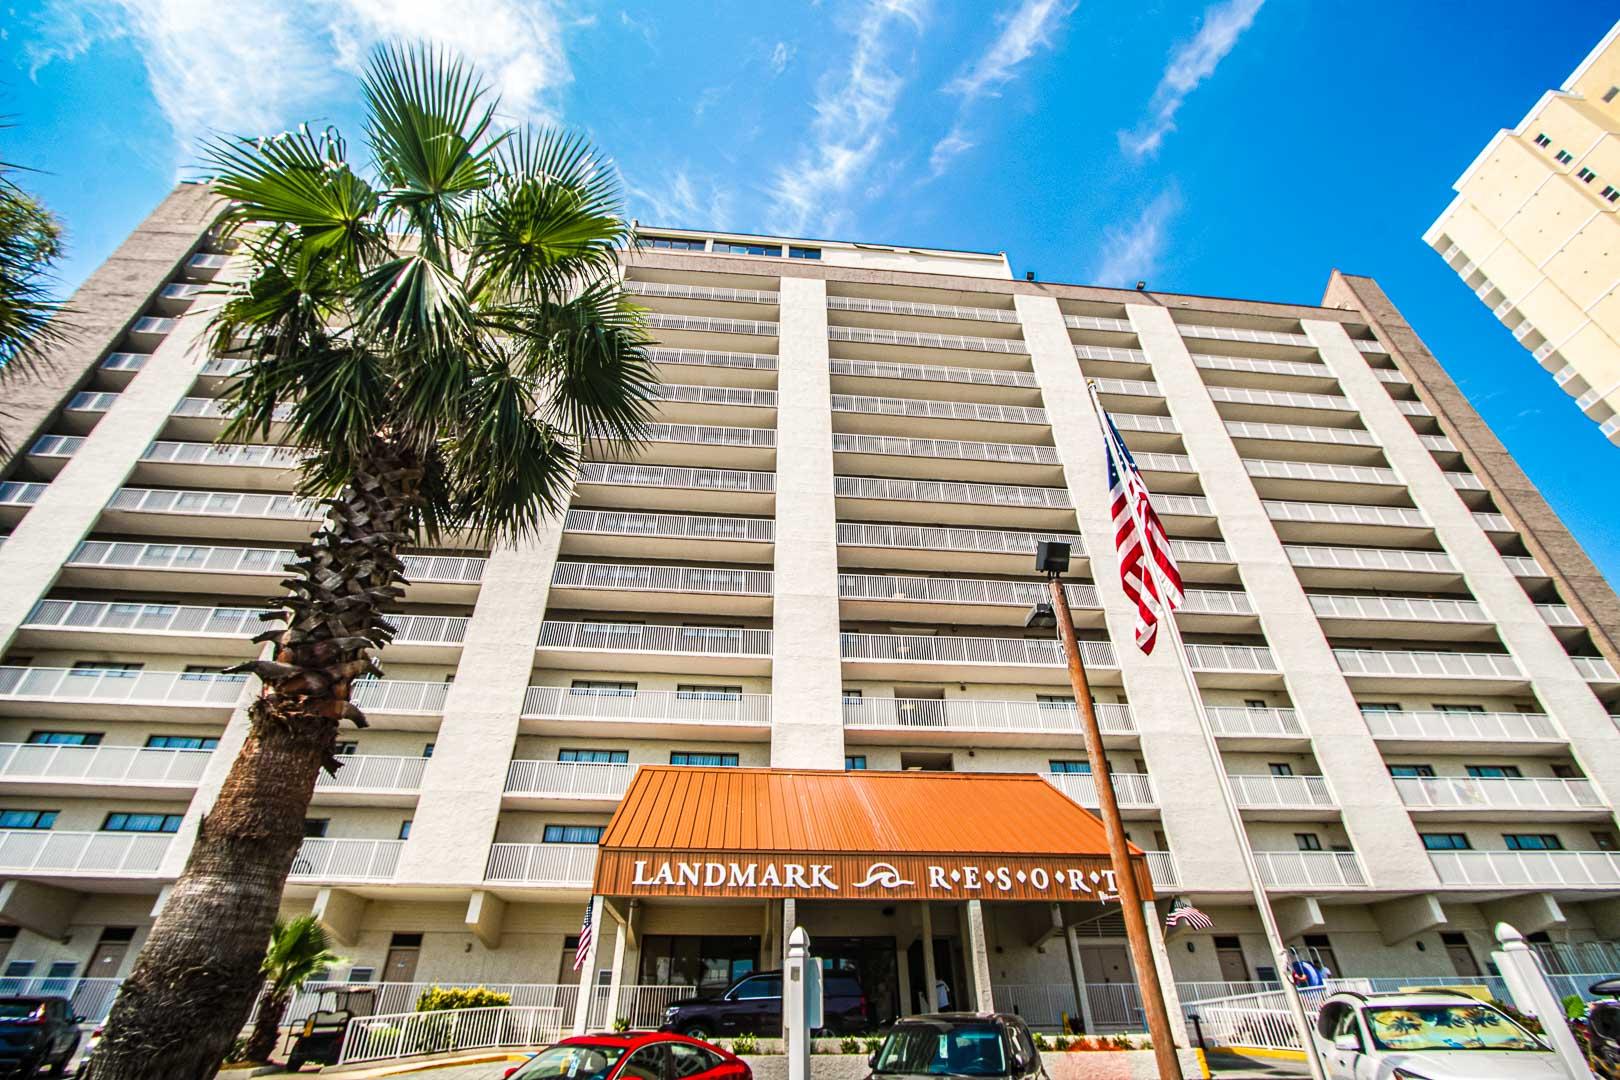 Landmark Holiday Beach Resort - Resort Exterior